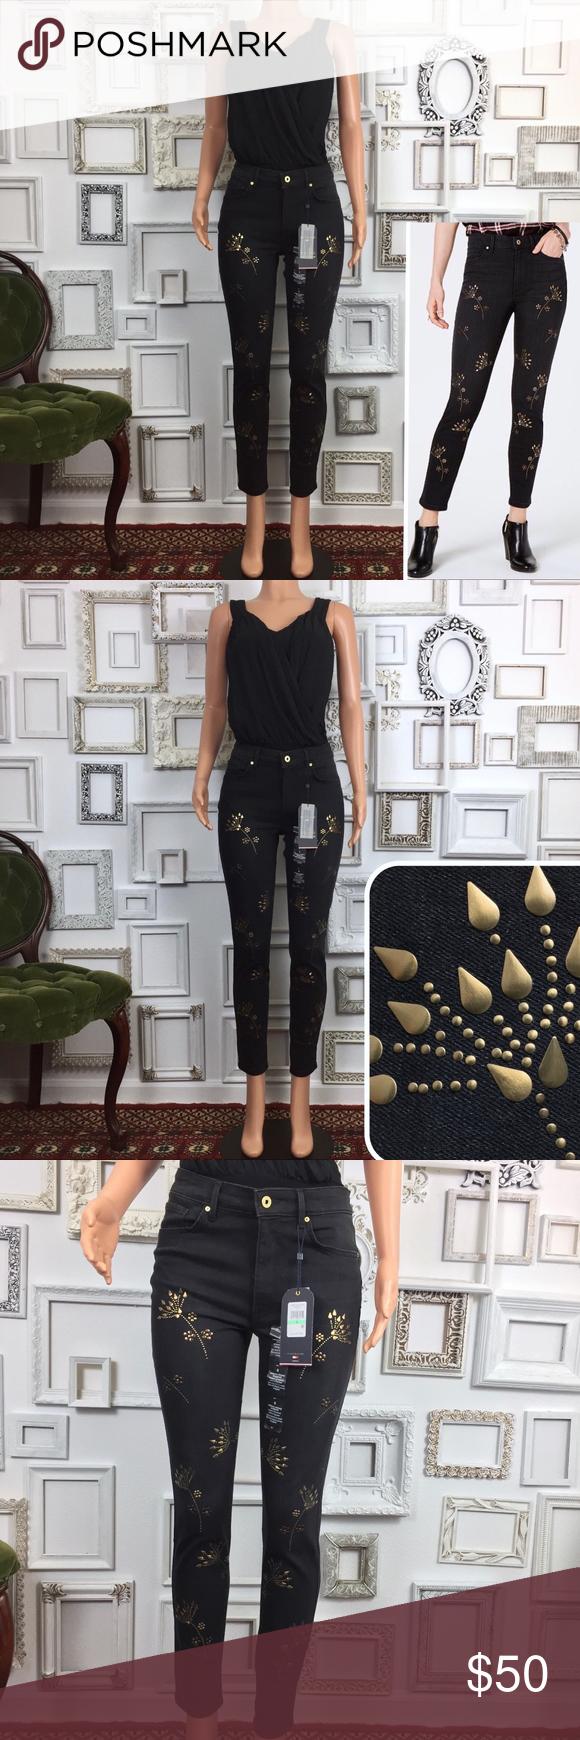 d5cb1f2de Tommy Hilfiger Tribeca Embellished Skinny Jeans 8 Condition: NWT. No flaws.  Description: